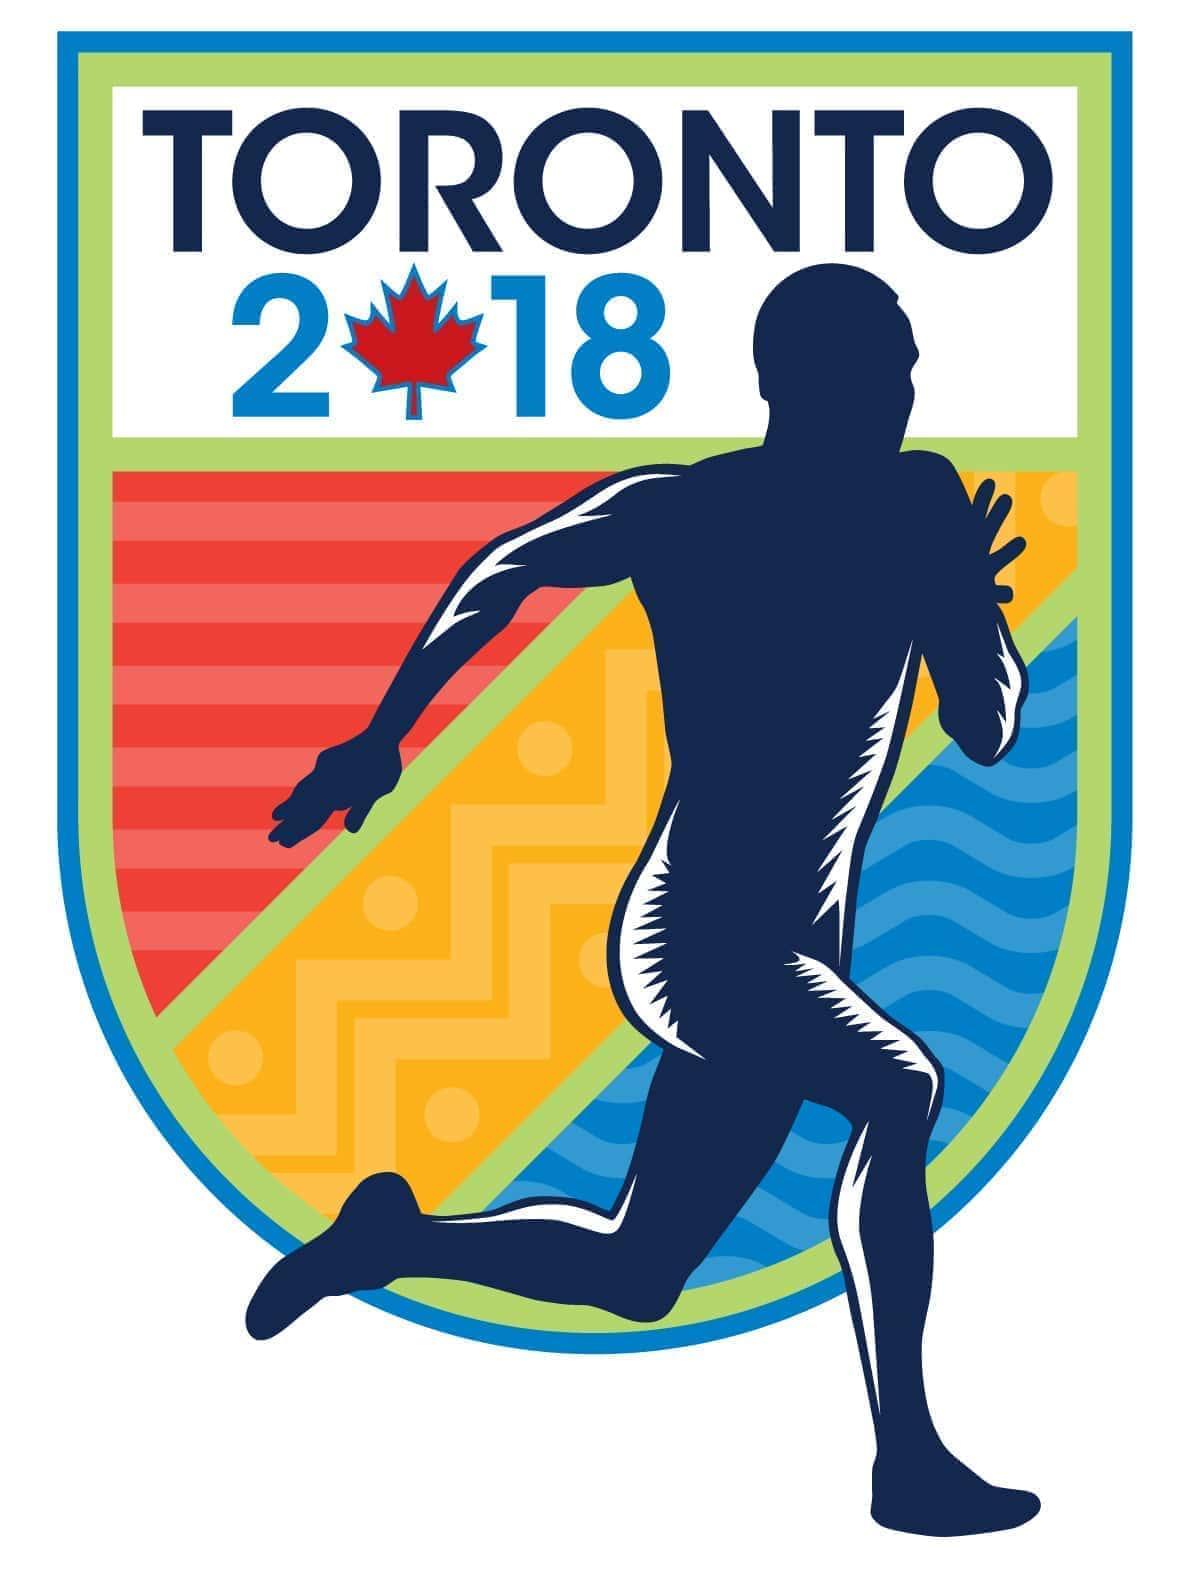 Speed dating toronto 2019 atletismo